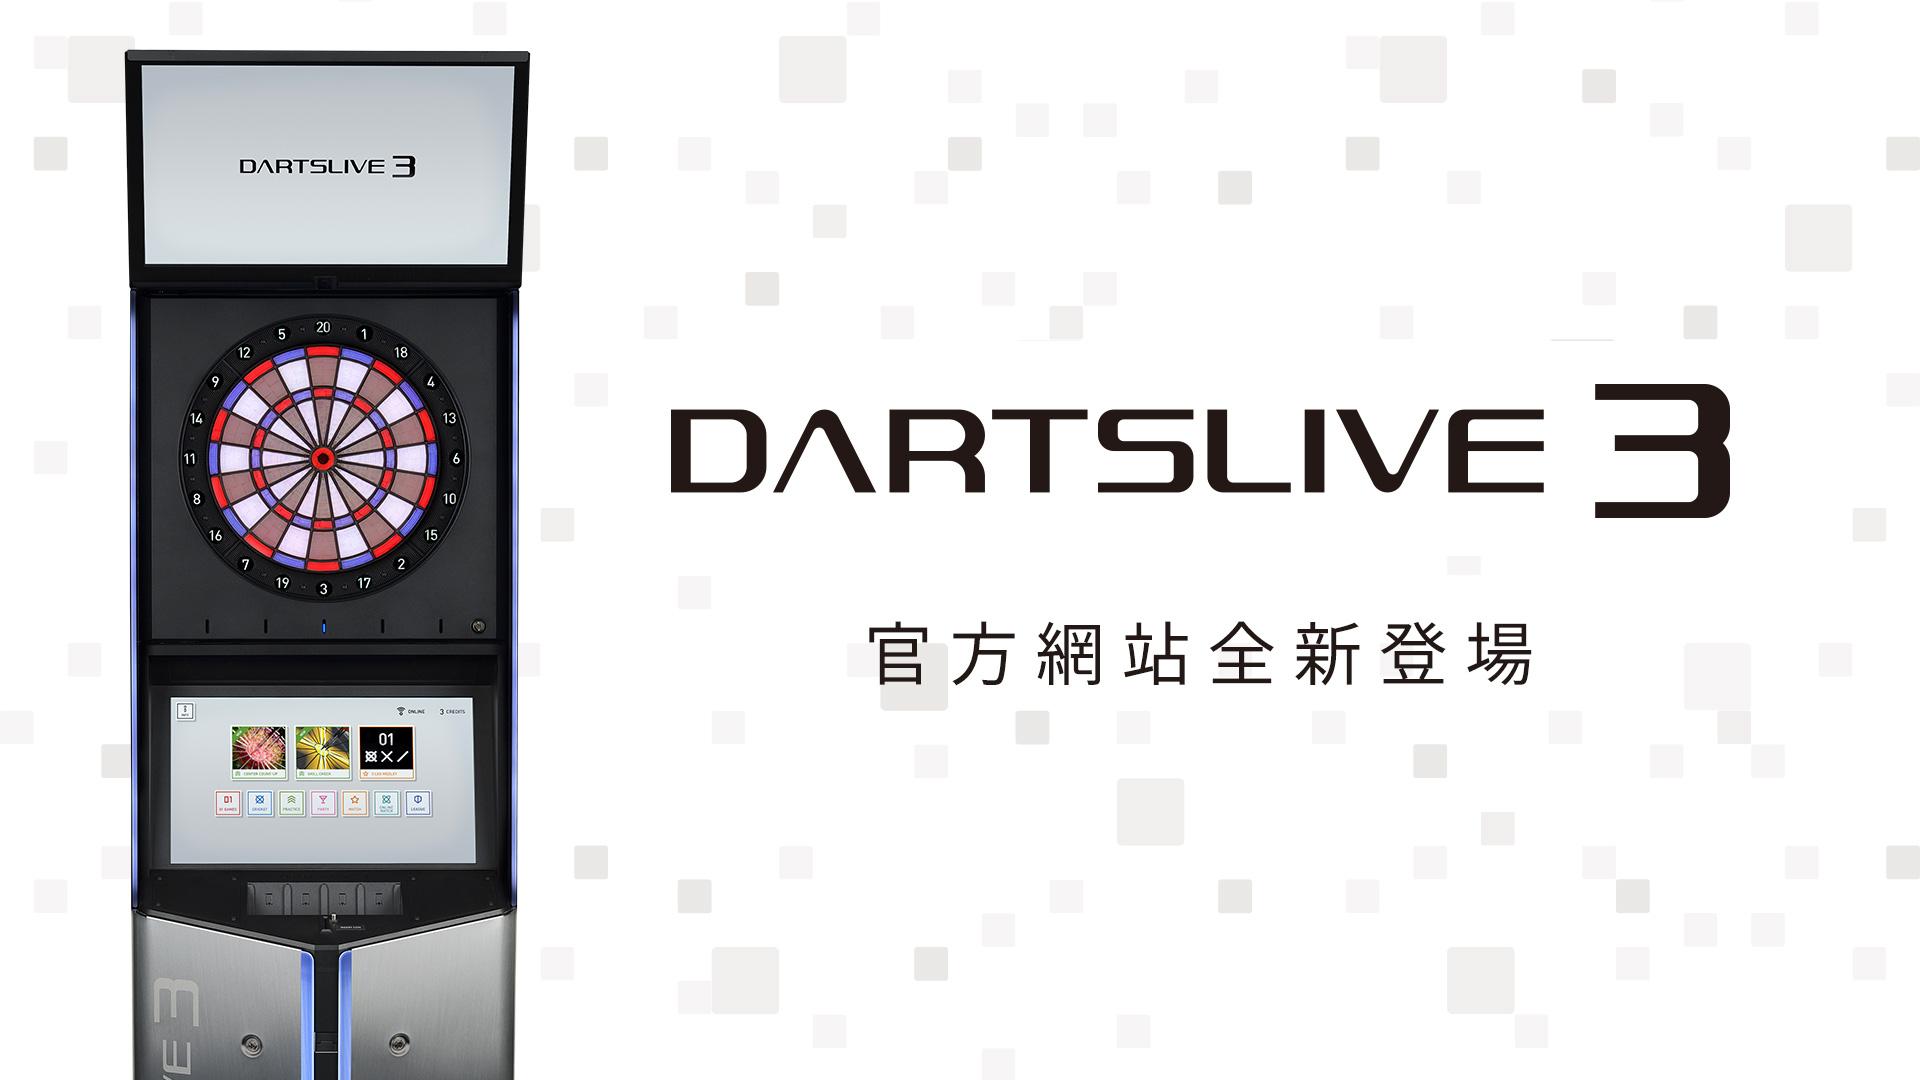 DARTSLIVE3官方網站全新登場